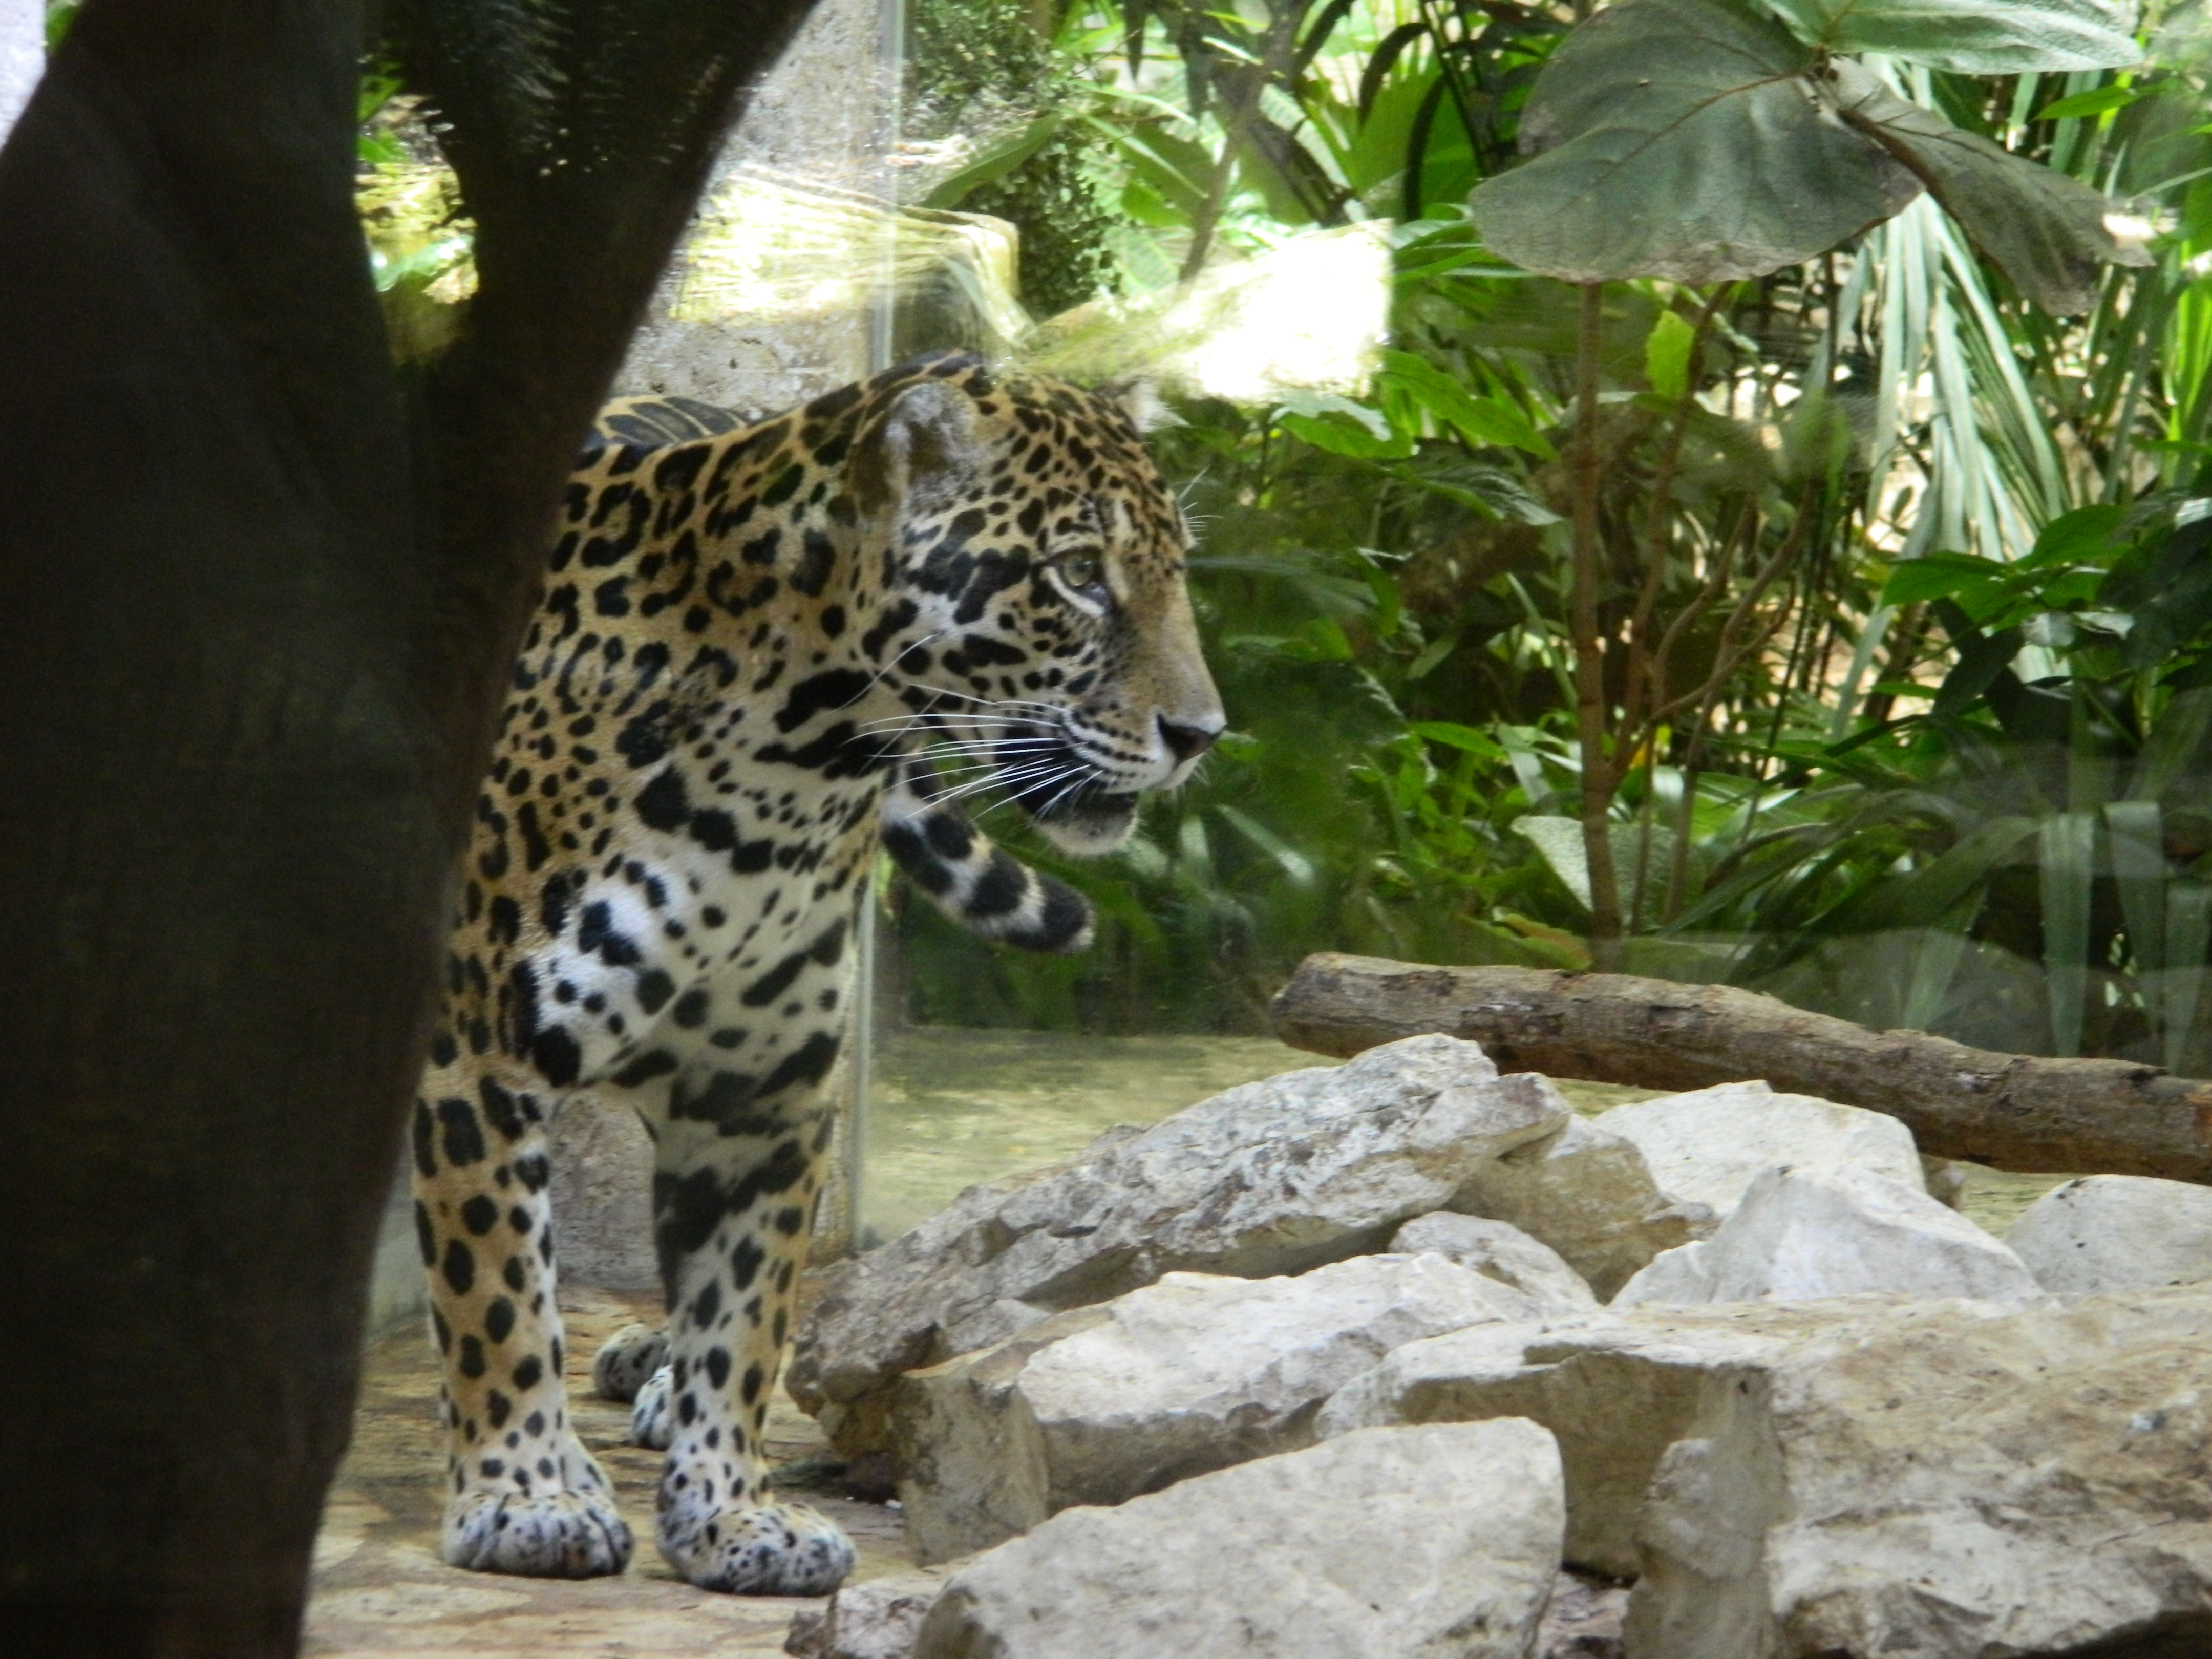 world aquarium patricia of com heatherington dallas jaguar